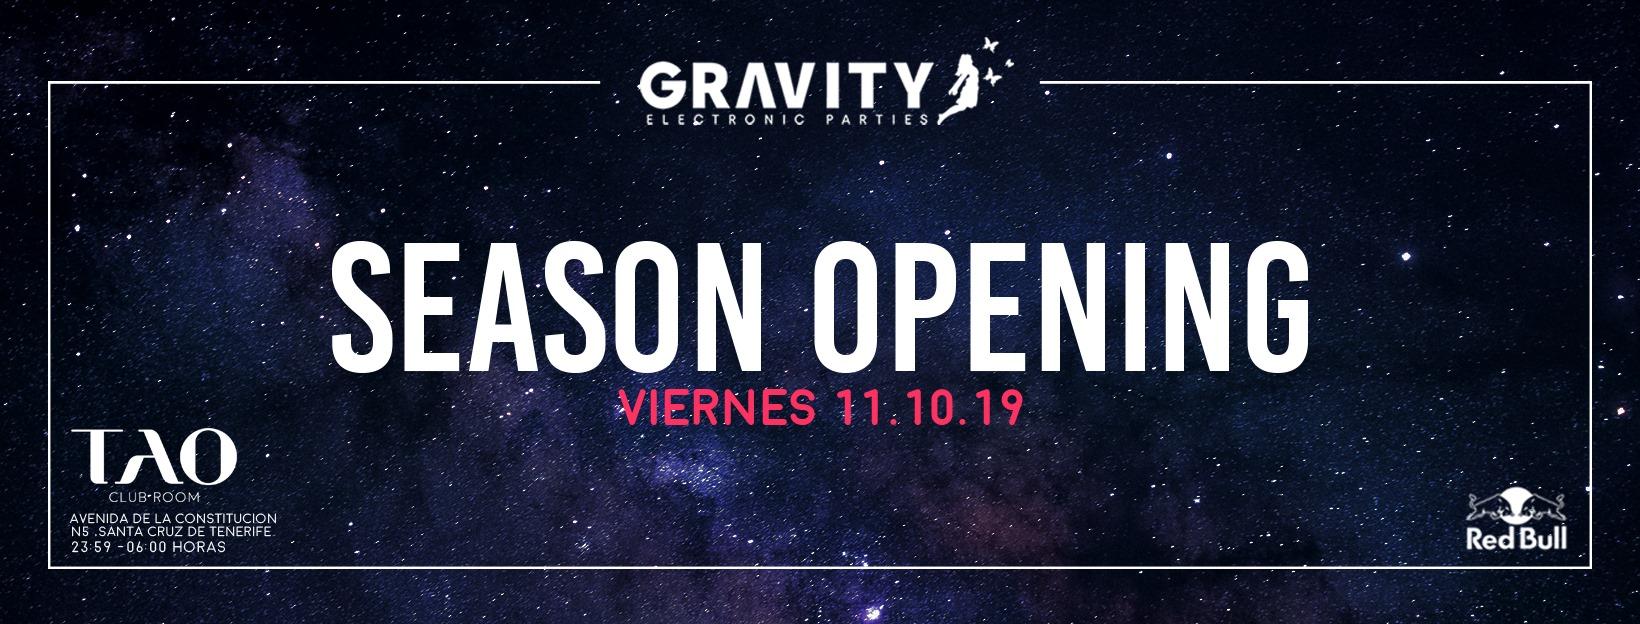 Gravity tenerife Season Opening